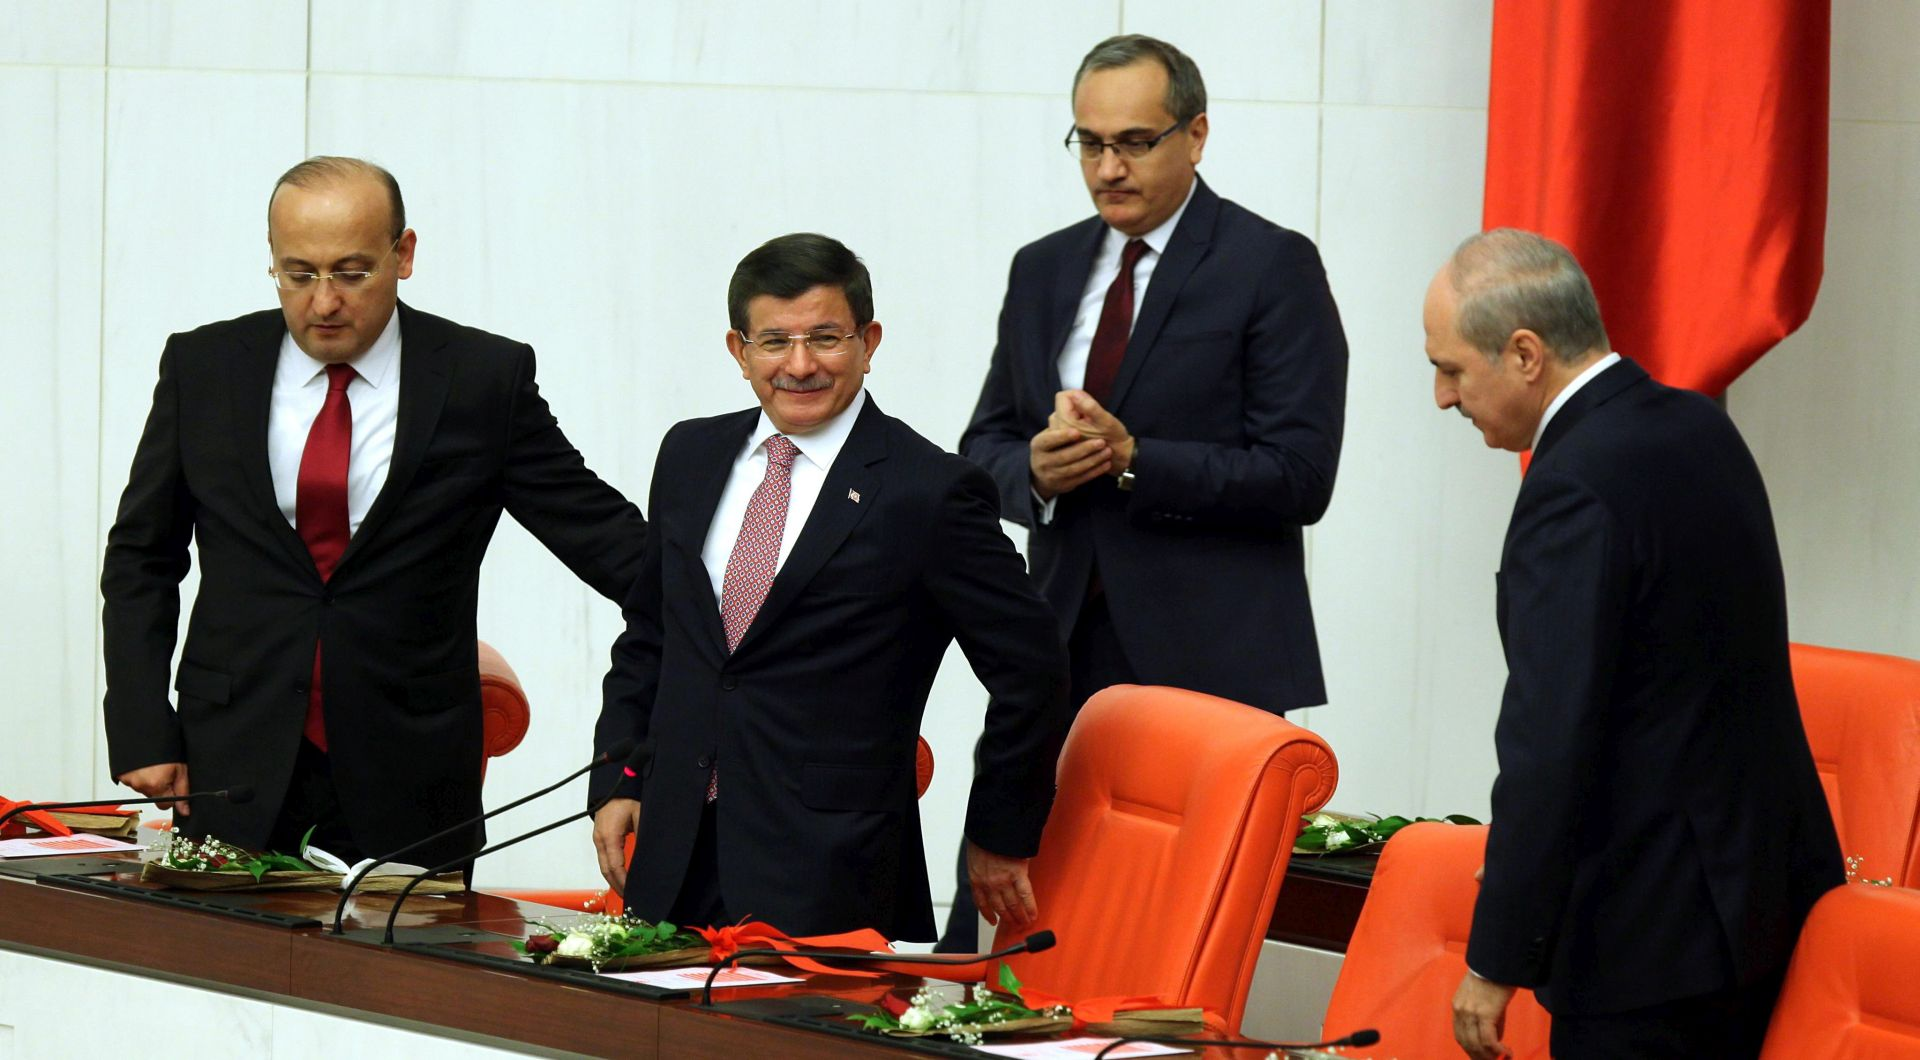 Erdogan dao Davutogluu mandat za sastav nove vlade